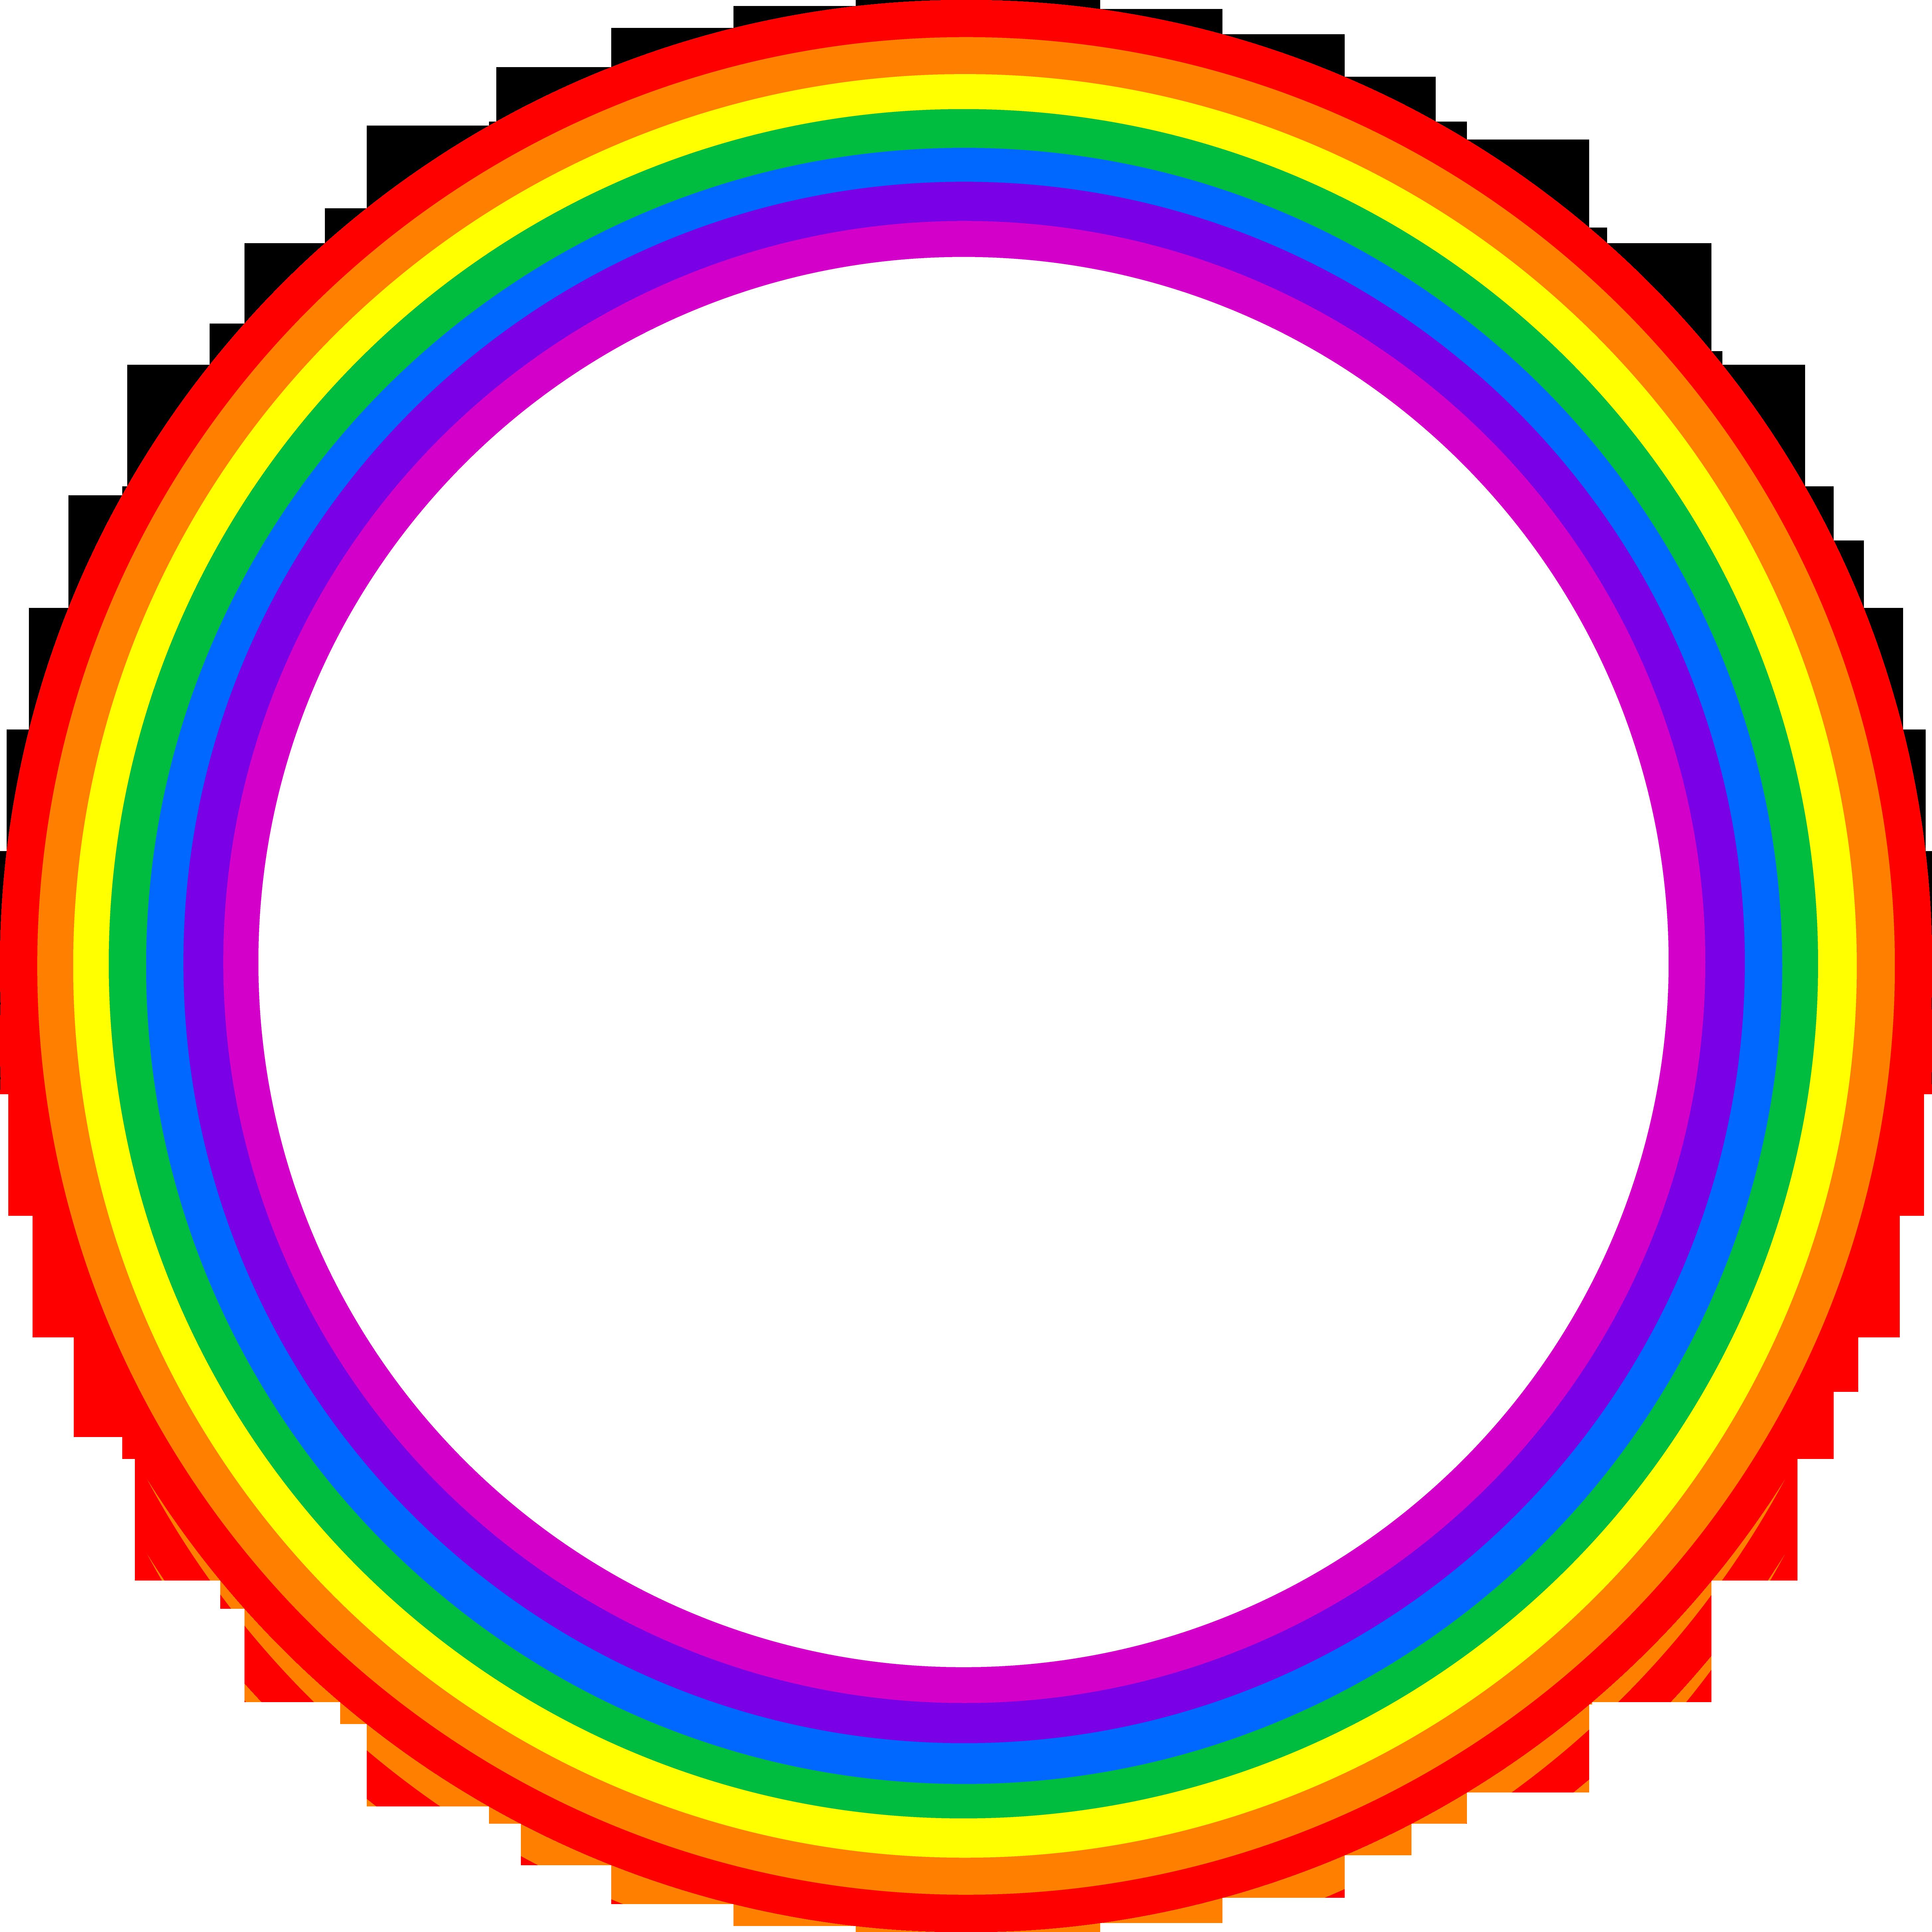 5816x5816 Full Circle Rainbow